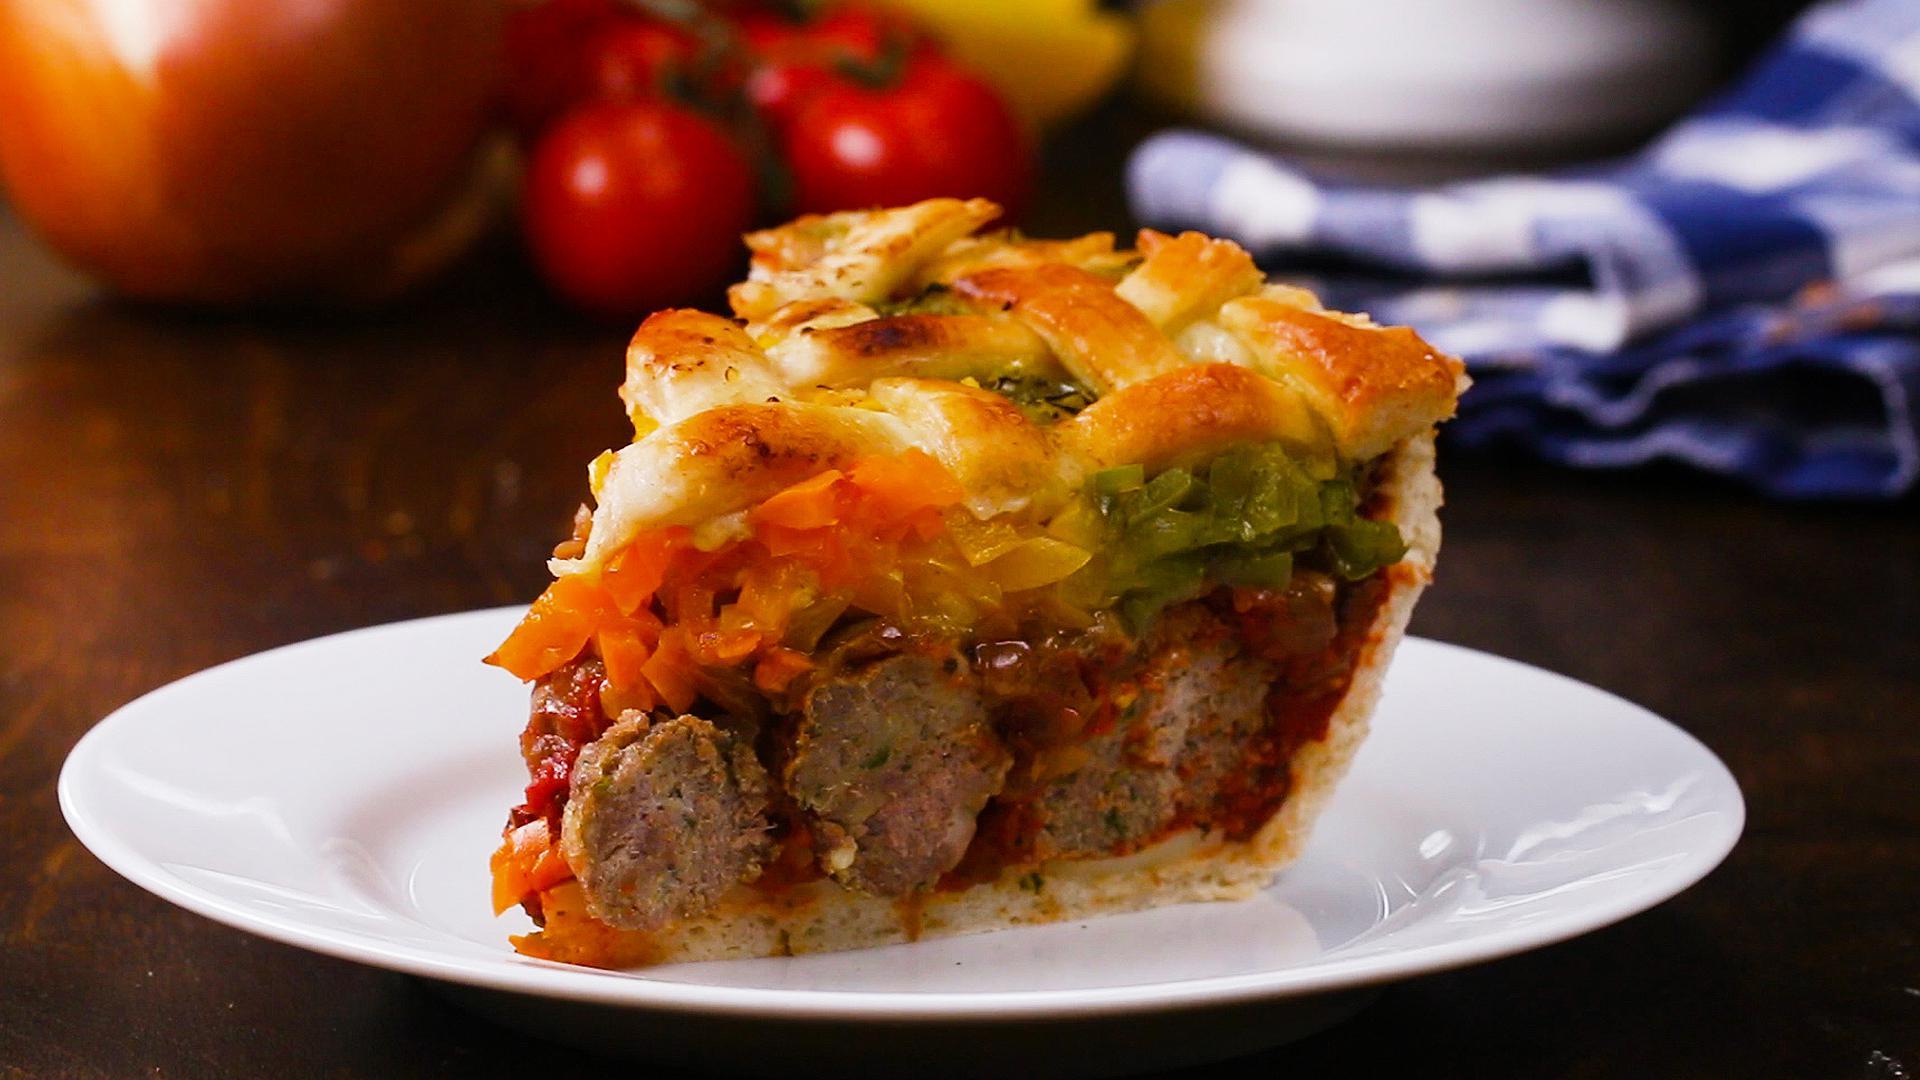 Keto Meatball Bake Recipes